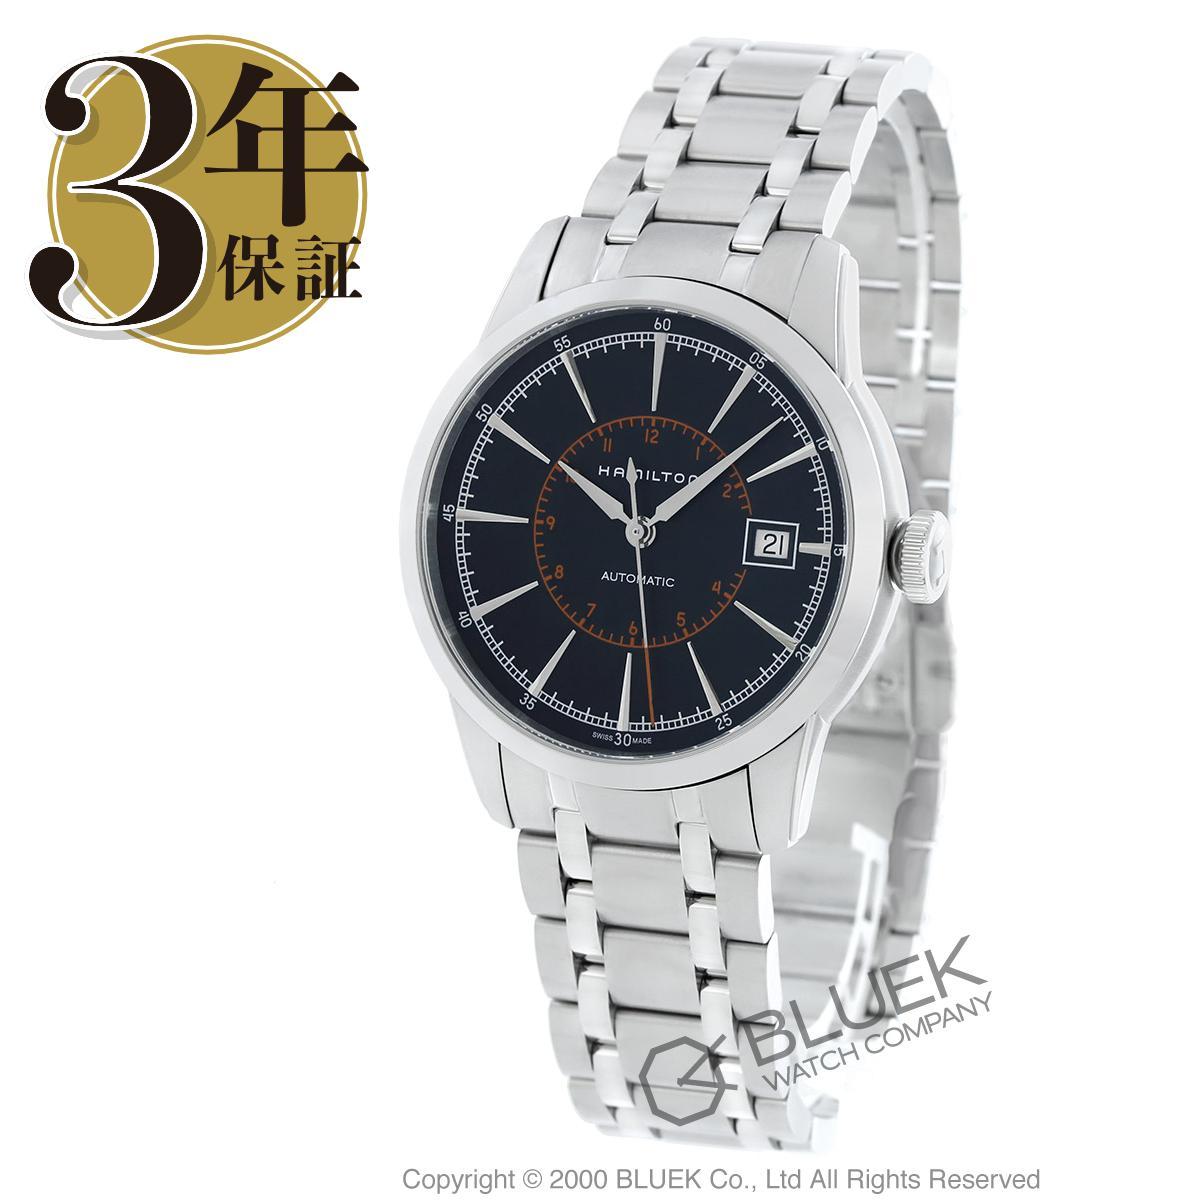 ab766aa0c727 ハミルトン レイルロード 腕時計 メンズ HAMILTON H40555131_8  [スーパーSALE][ハミルトン][H40555131][HAMILTON][時計][新品]